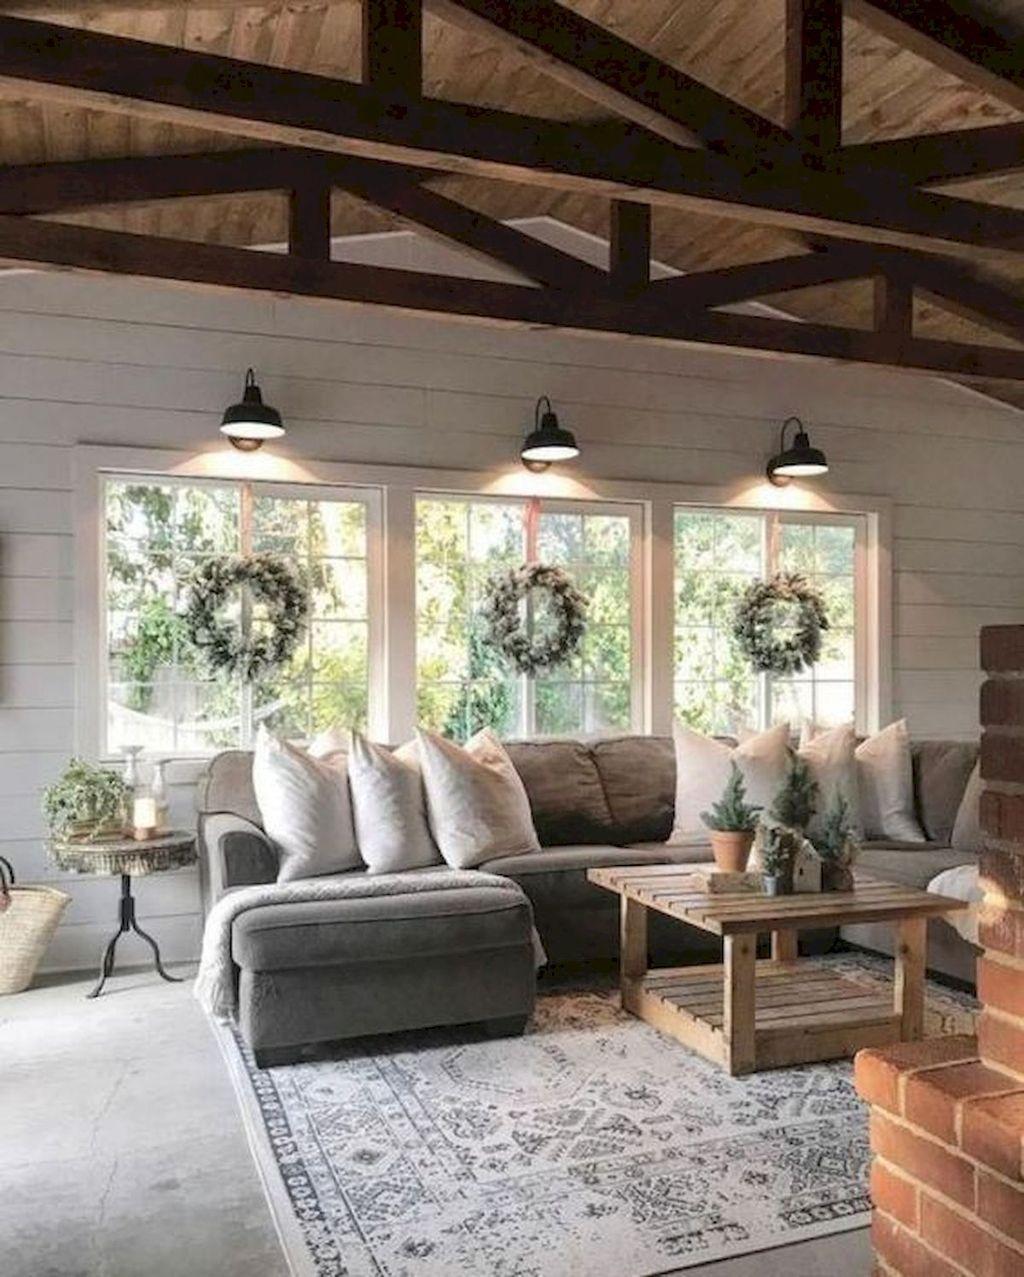 Stunning Farmhouse Interior Design Ideas To Realize Your Dreams 22